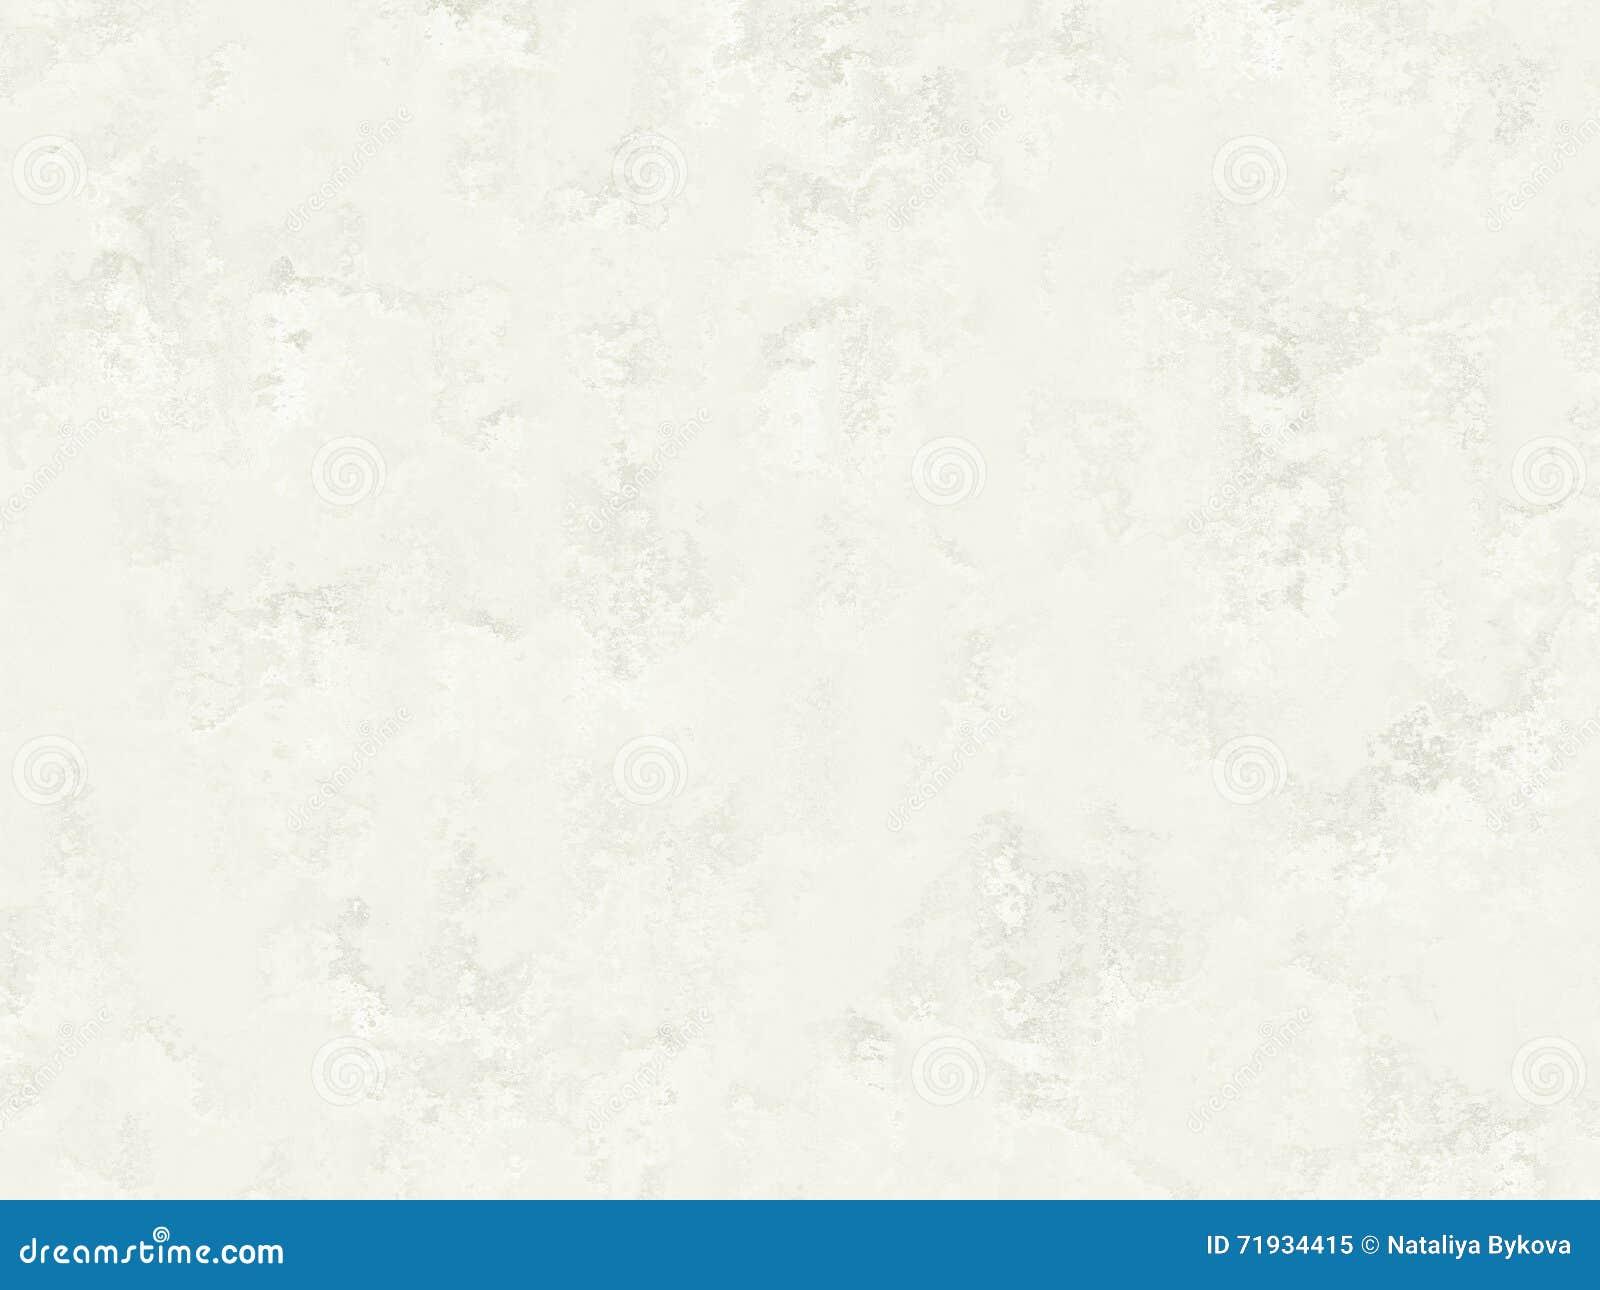 Белая текстура grunge стены, представляет